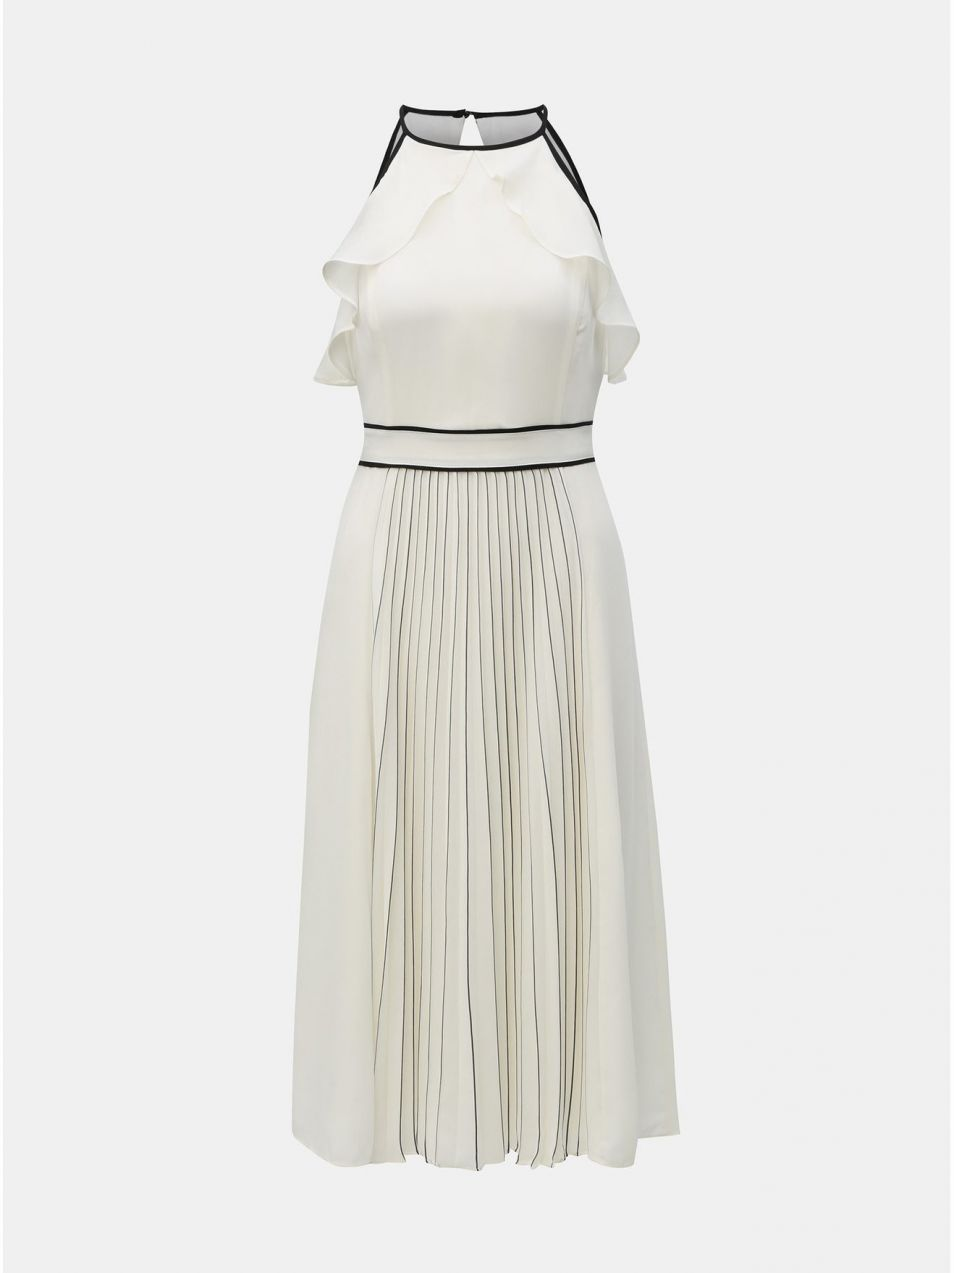 d7ffd511d624 Biele plisované šaty Dorothy Perkins značky Dorothy Perkins - Lovely.sk